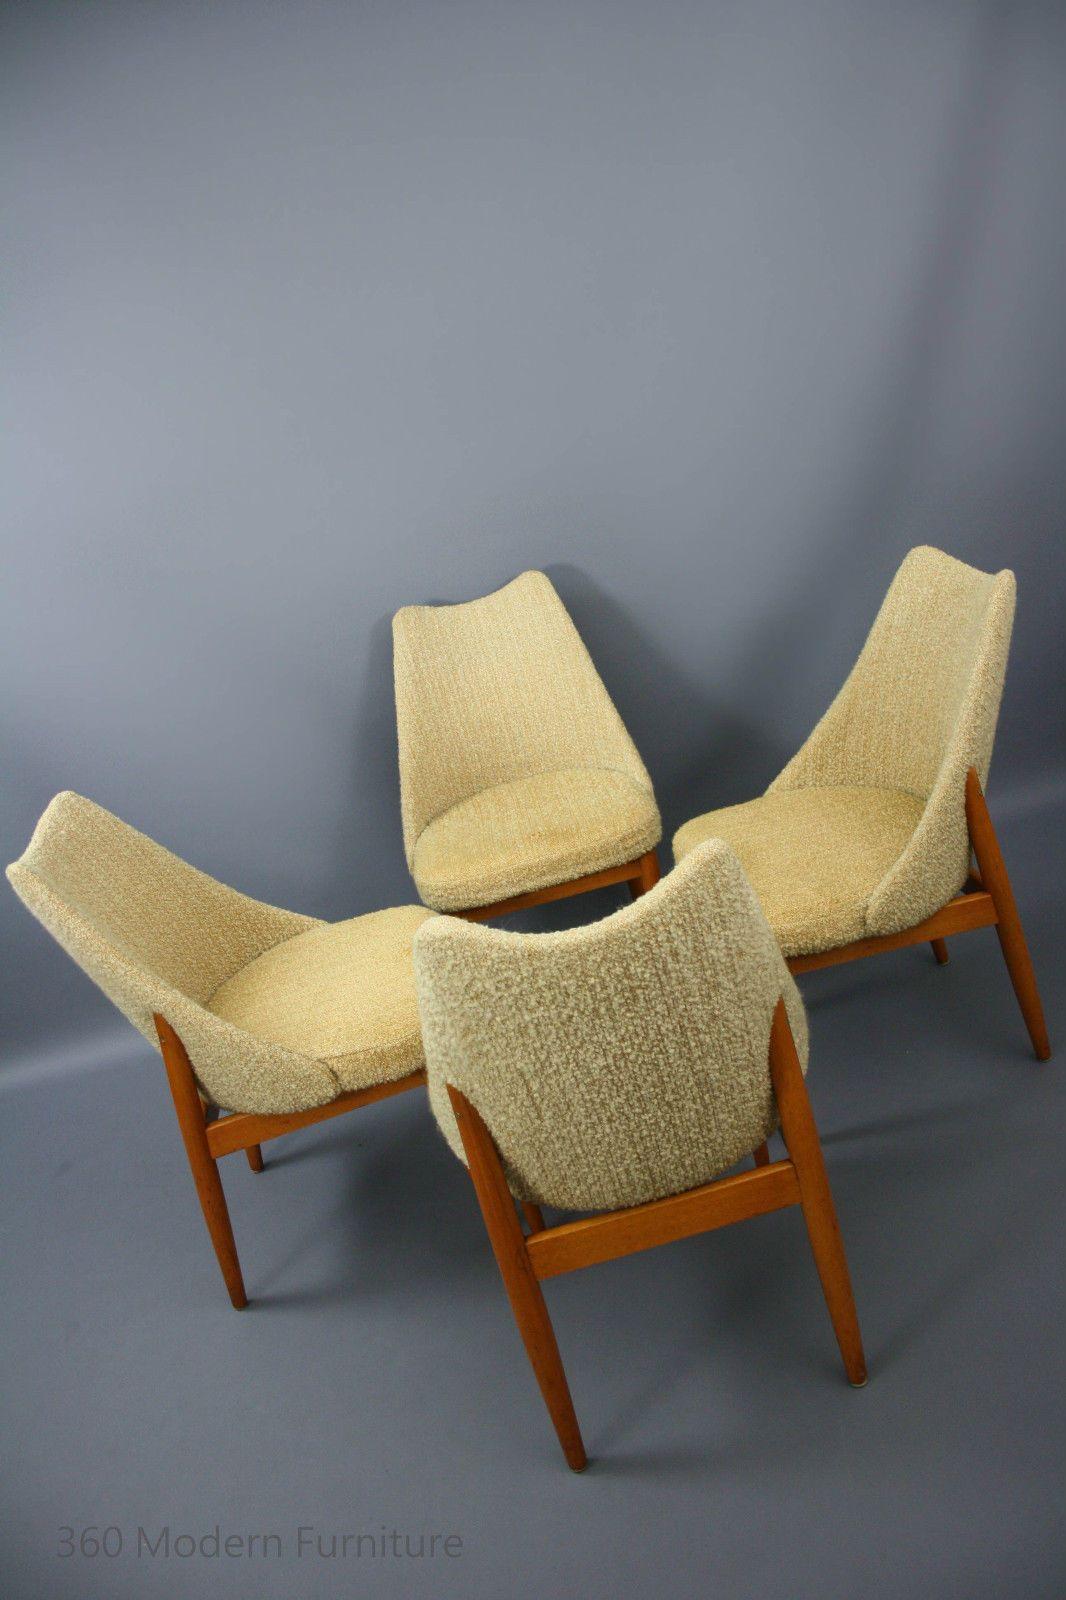 Mid century dining chairs set of 4 teak vintage retro danish parker featherston eames era in narre warren 360 modern furniture vic ebay